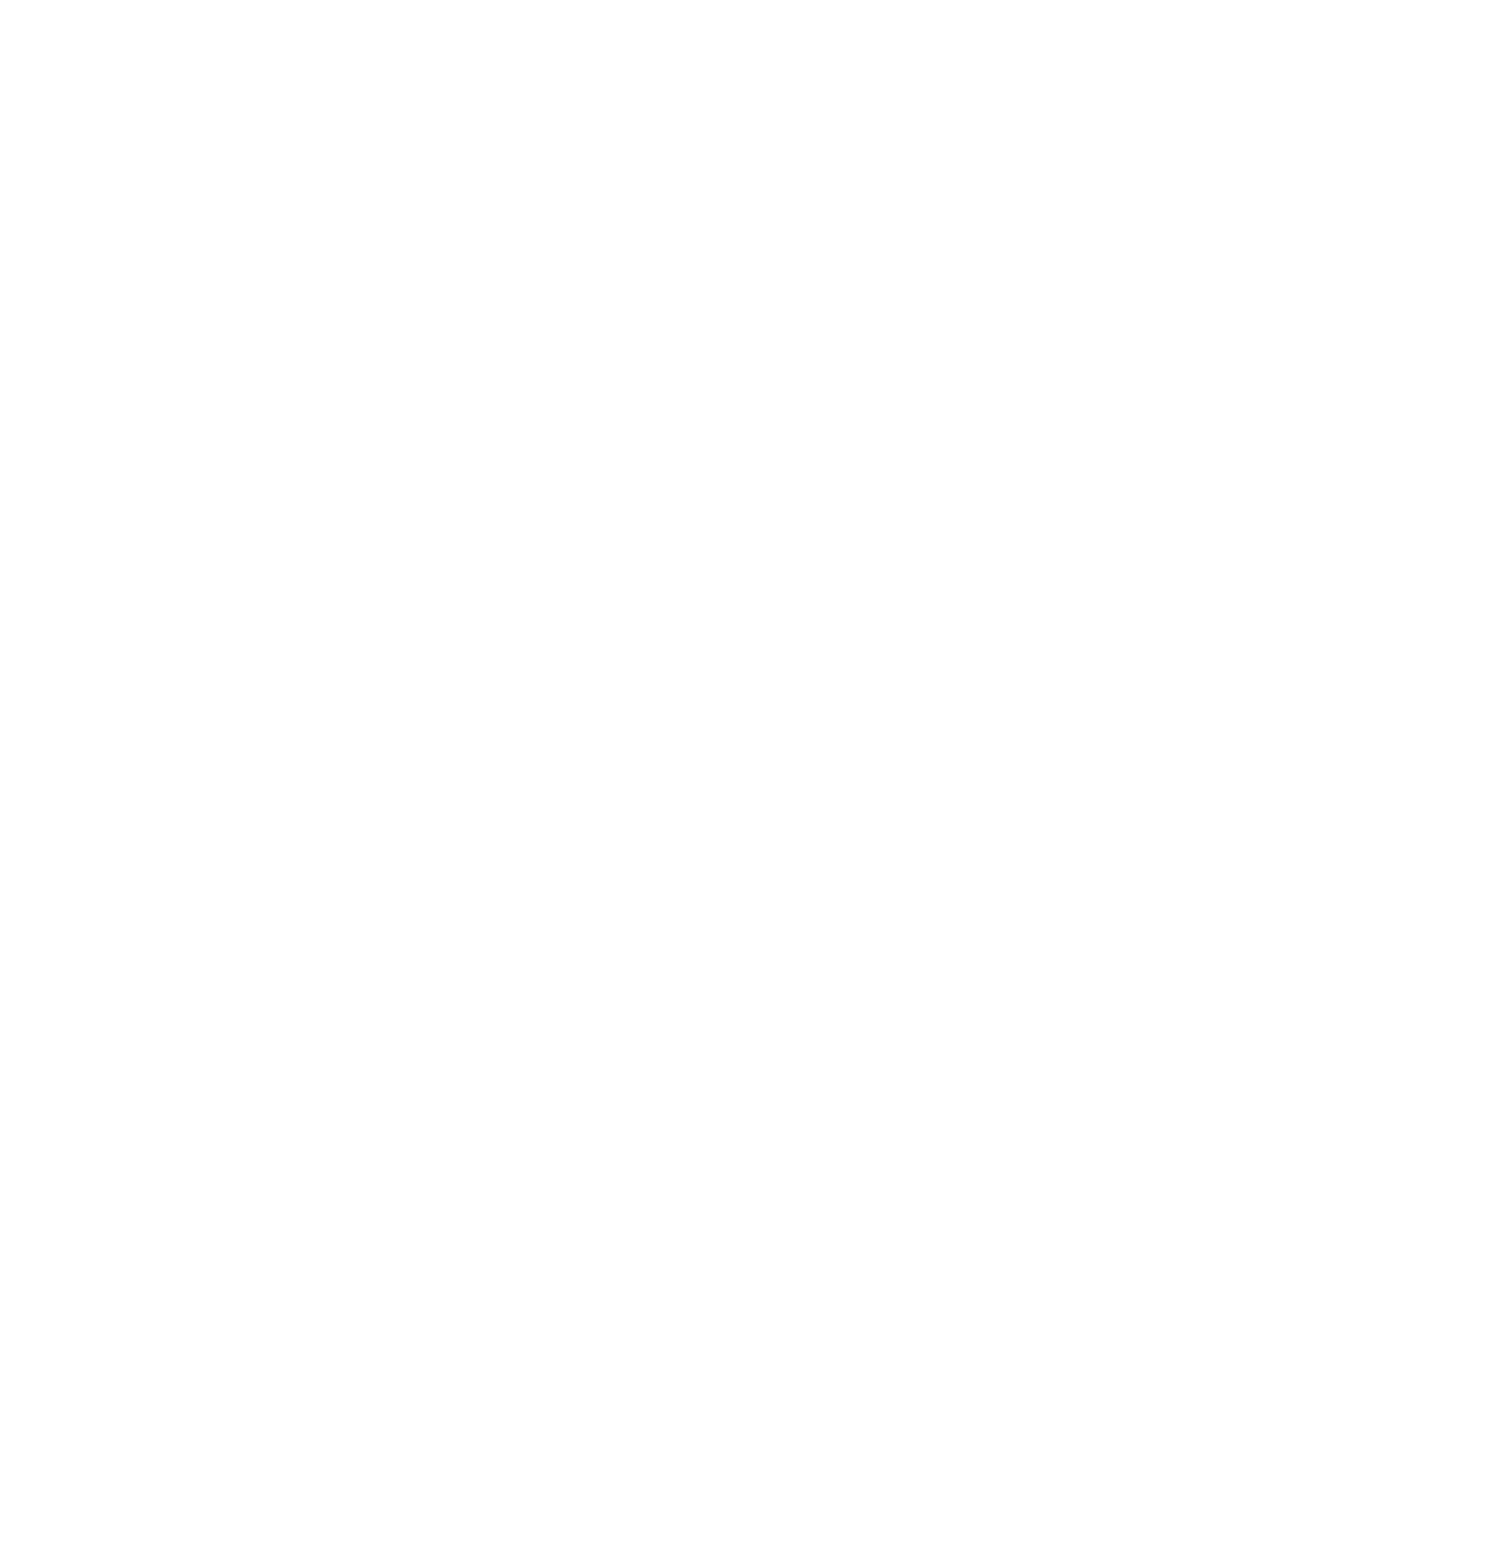 2019_MidwestCannaExpo-Logo_White (1).png